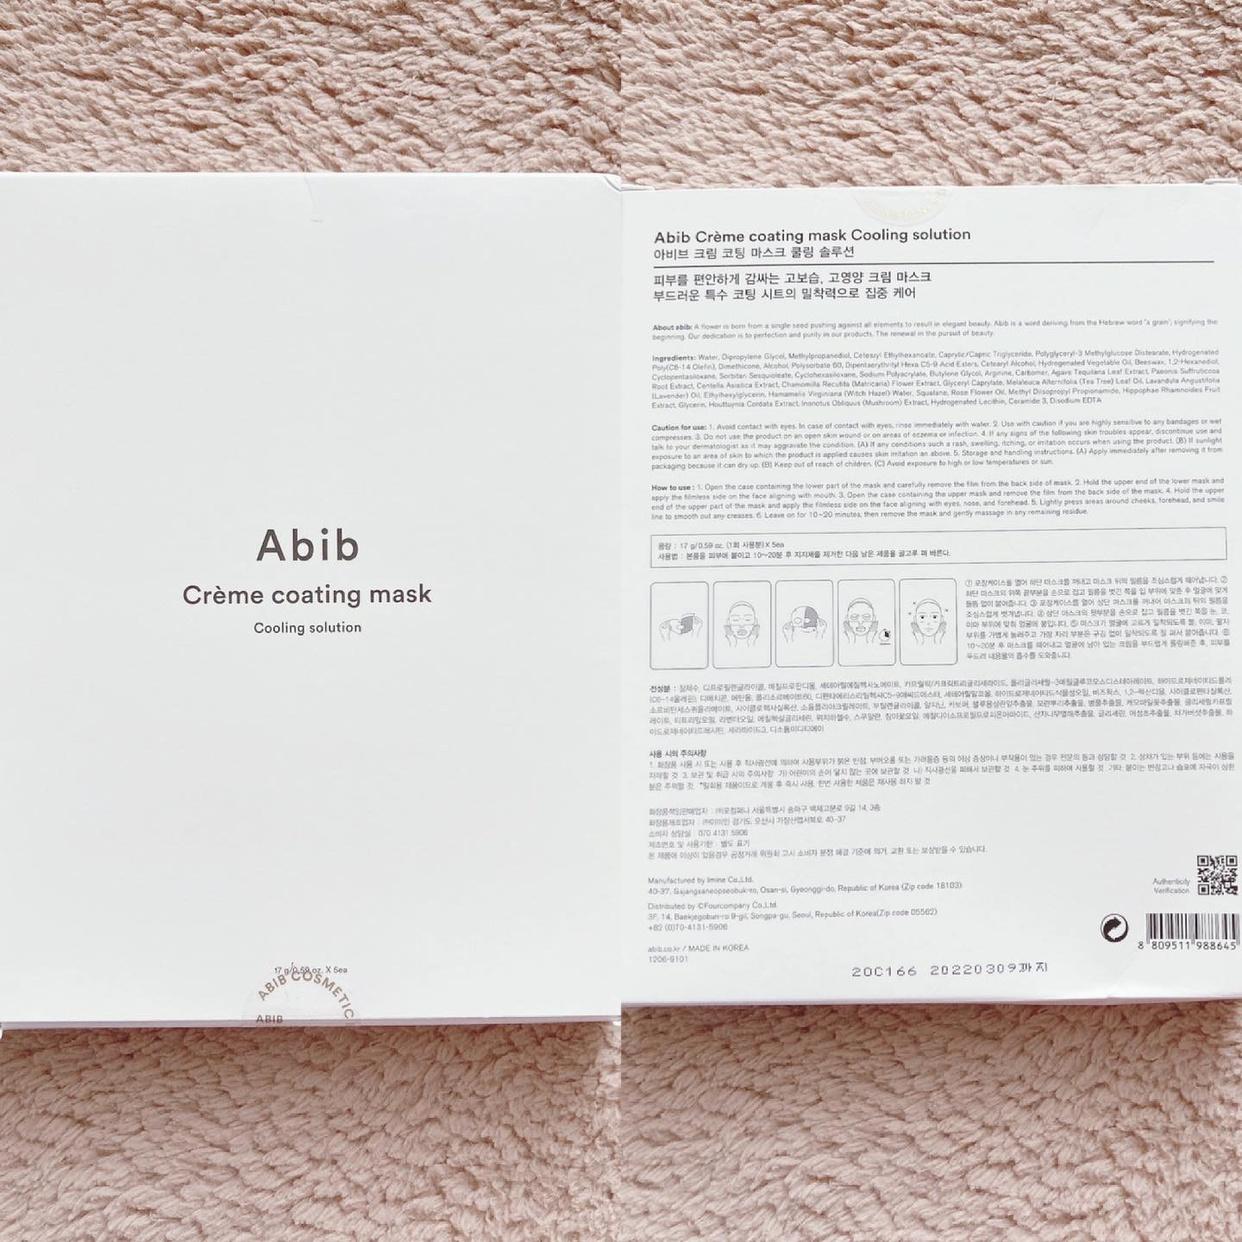 Abib(アビブ) クリームコーティングマスククーリングソリューションの良い点・メリットに関するyunaさんの口コミ画像2